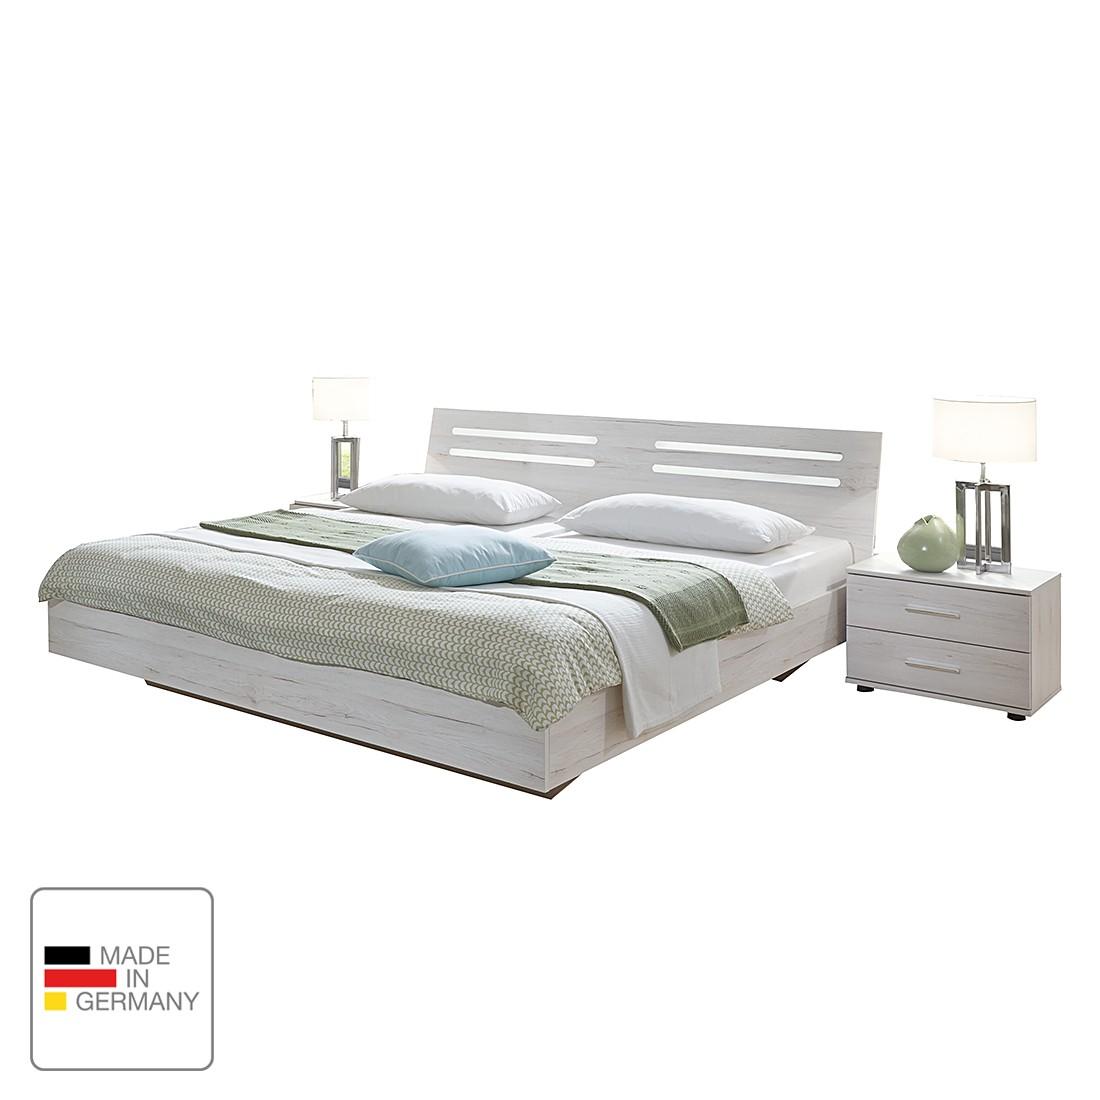 vente futon tritoo maison et jardin. Black Bedroom Furniture Sets. Home Design Ideas